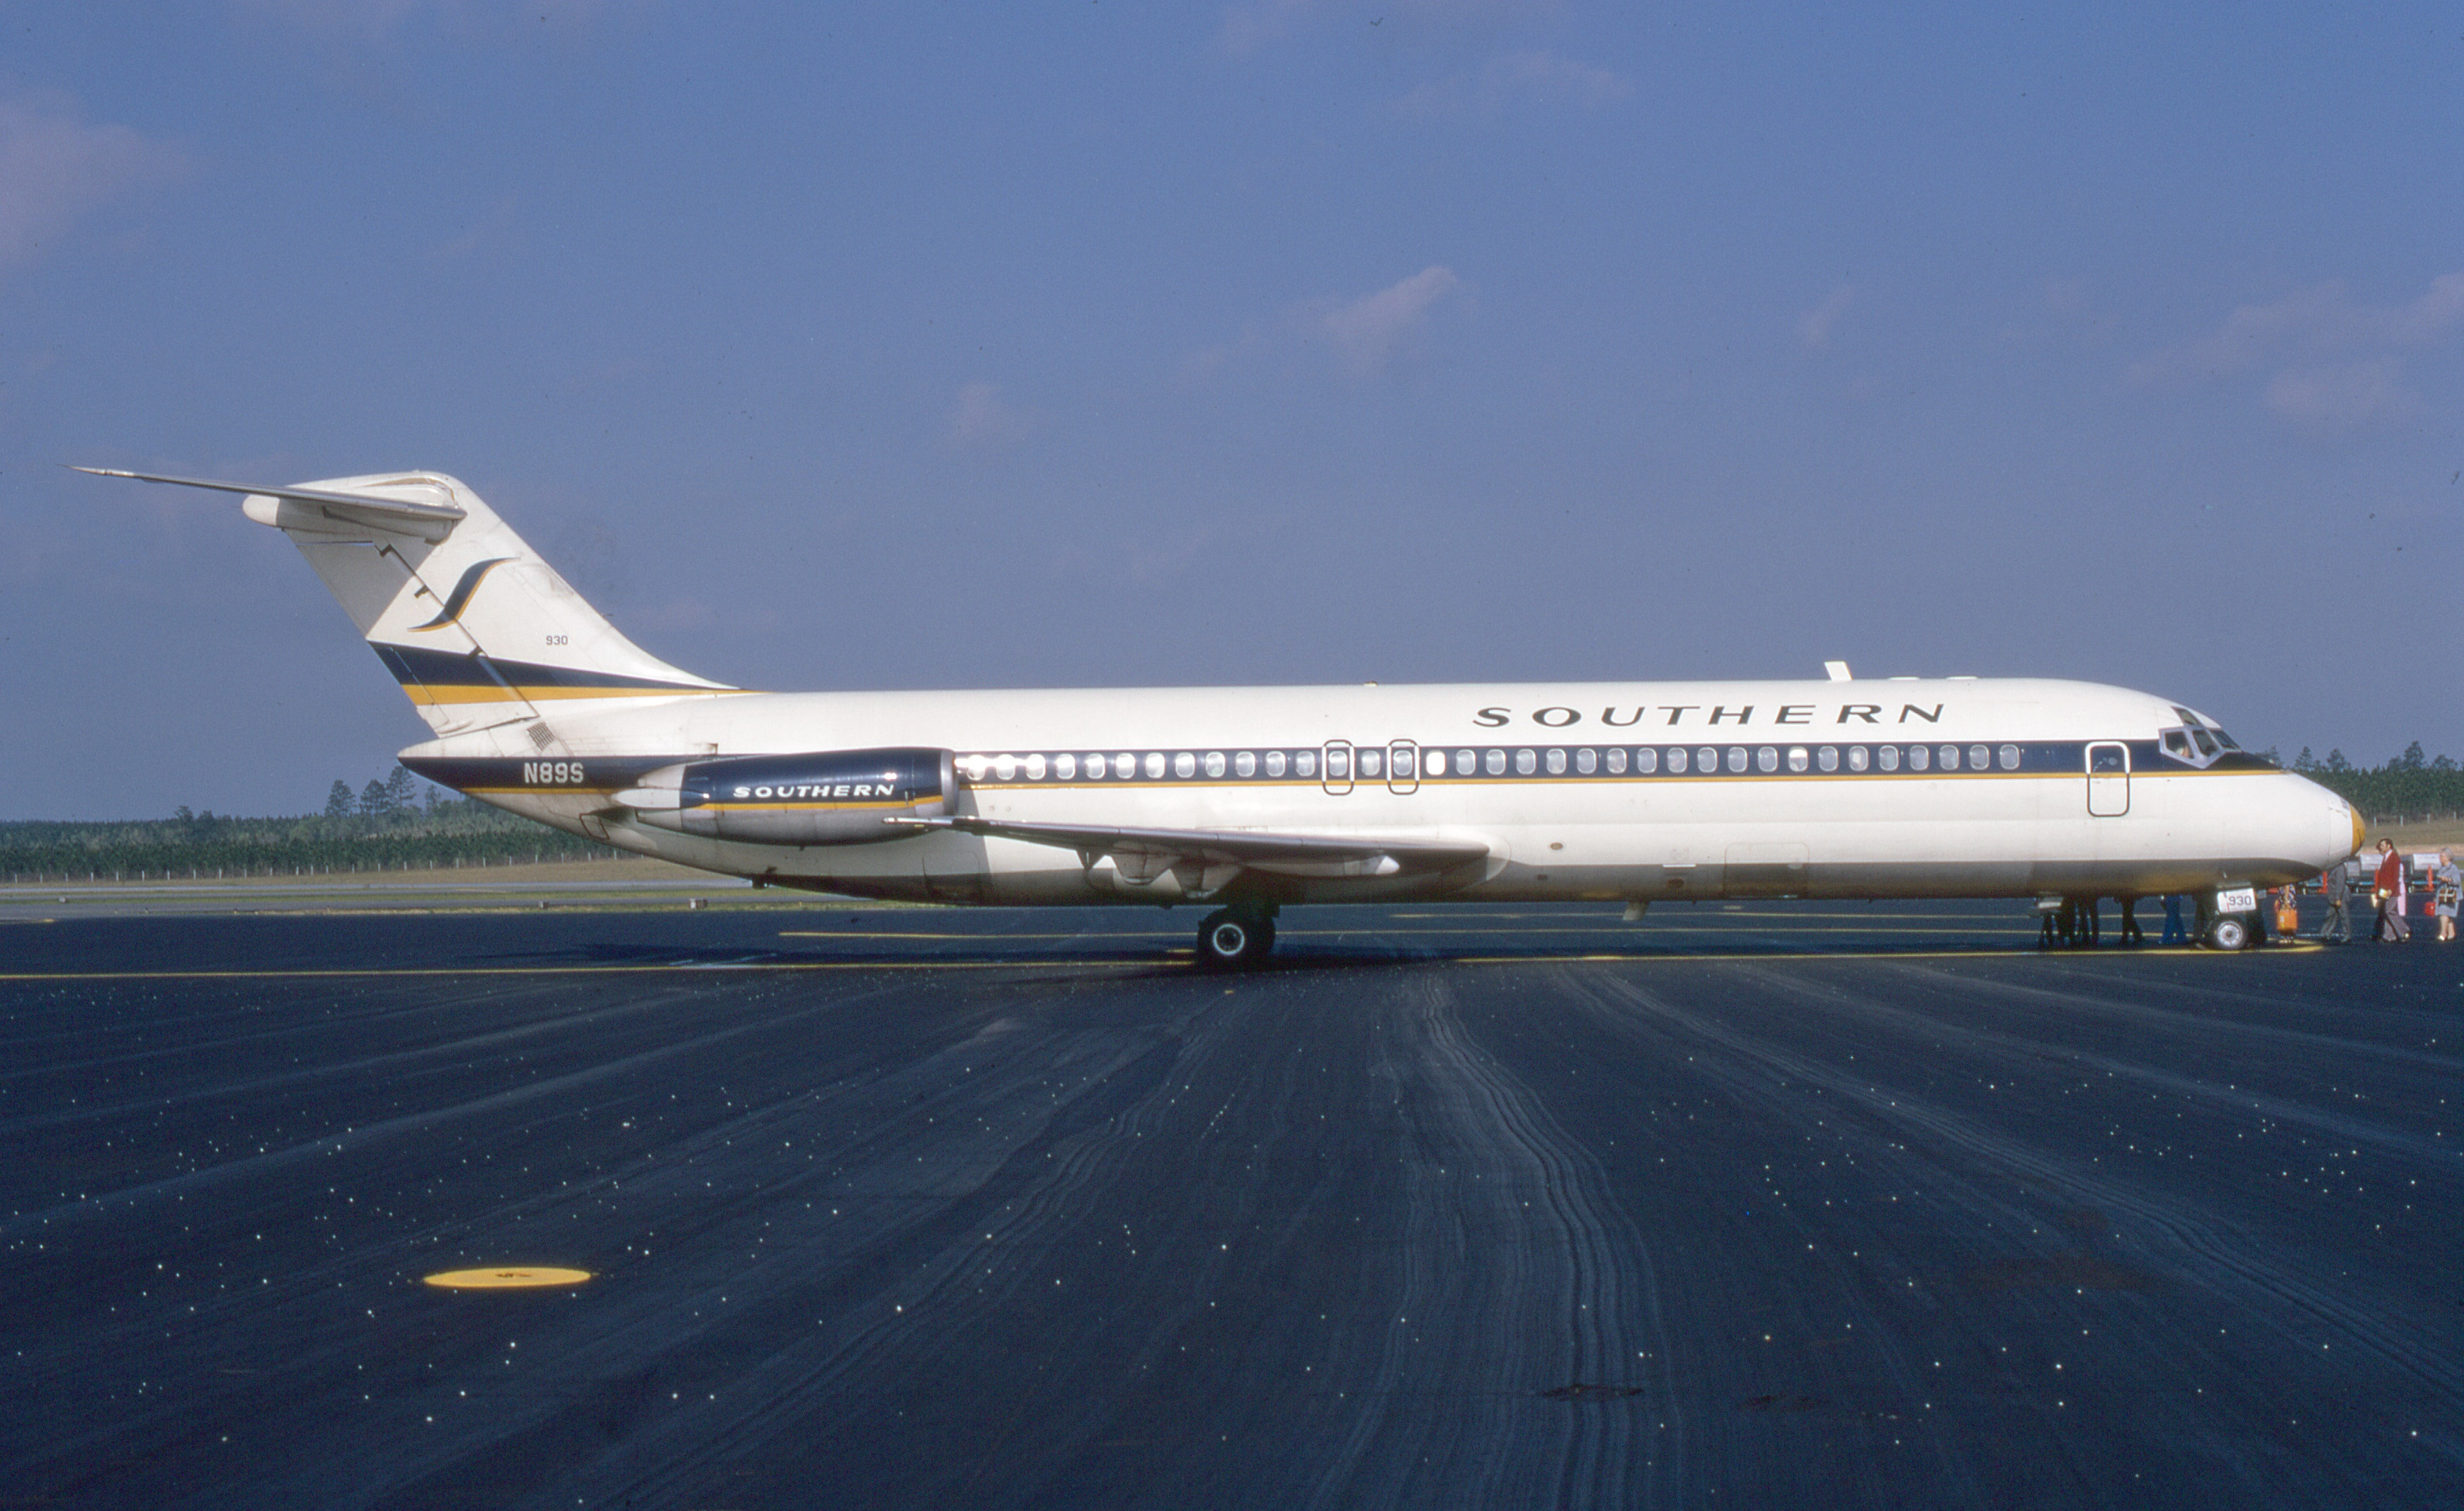 Southern Airways Flight 932 - Wikipedia